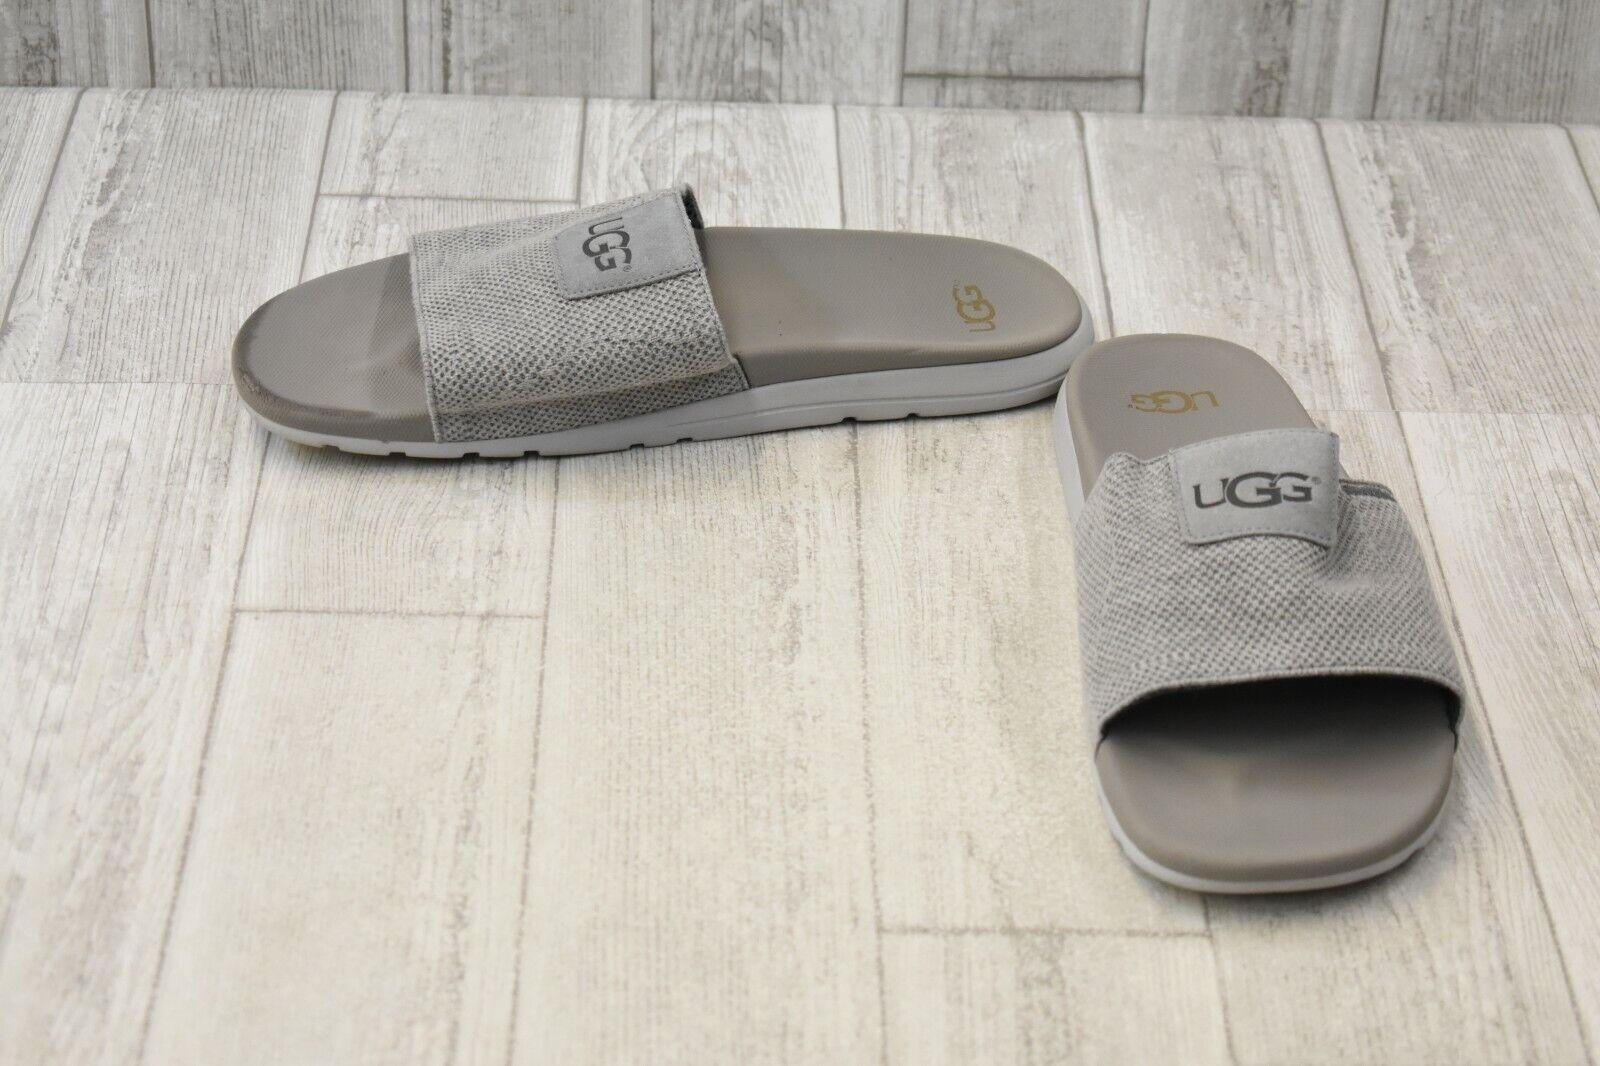 7a2cd26ac65 UGG Mens Xavier Hyperweave Seal Gray Knit Slide Sandals 1092299